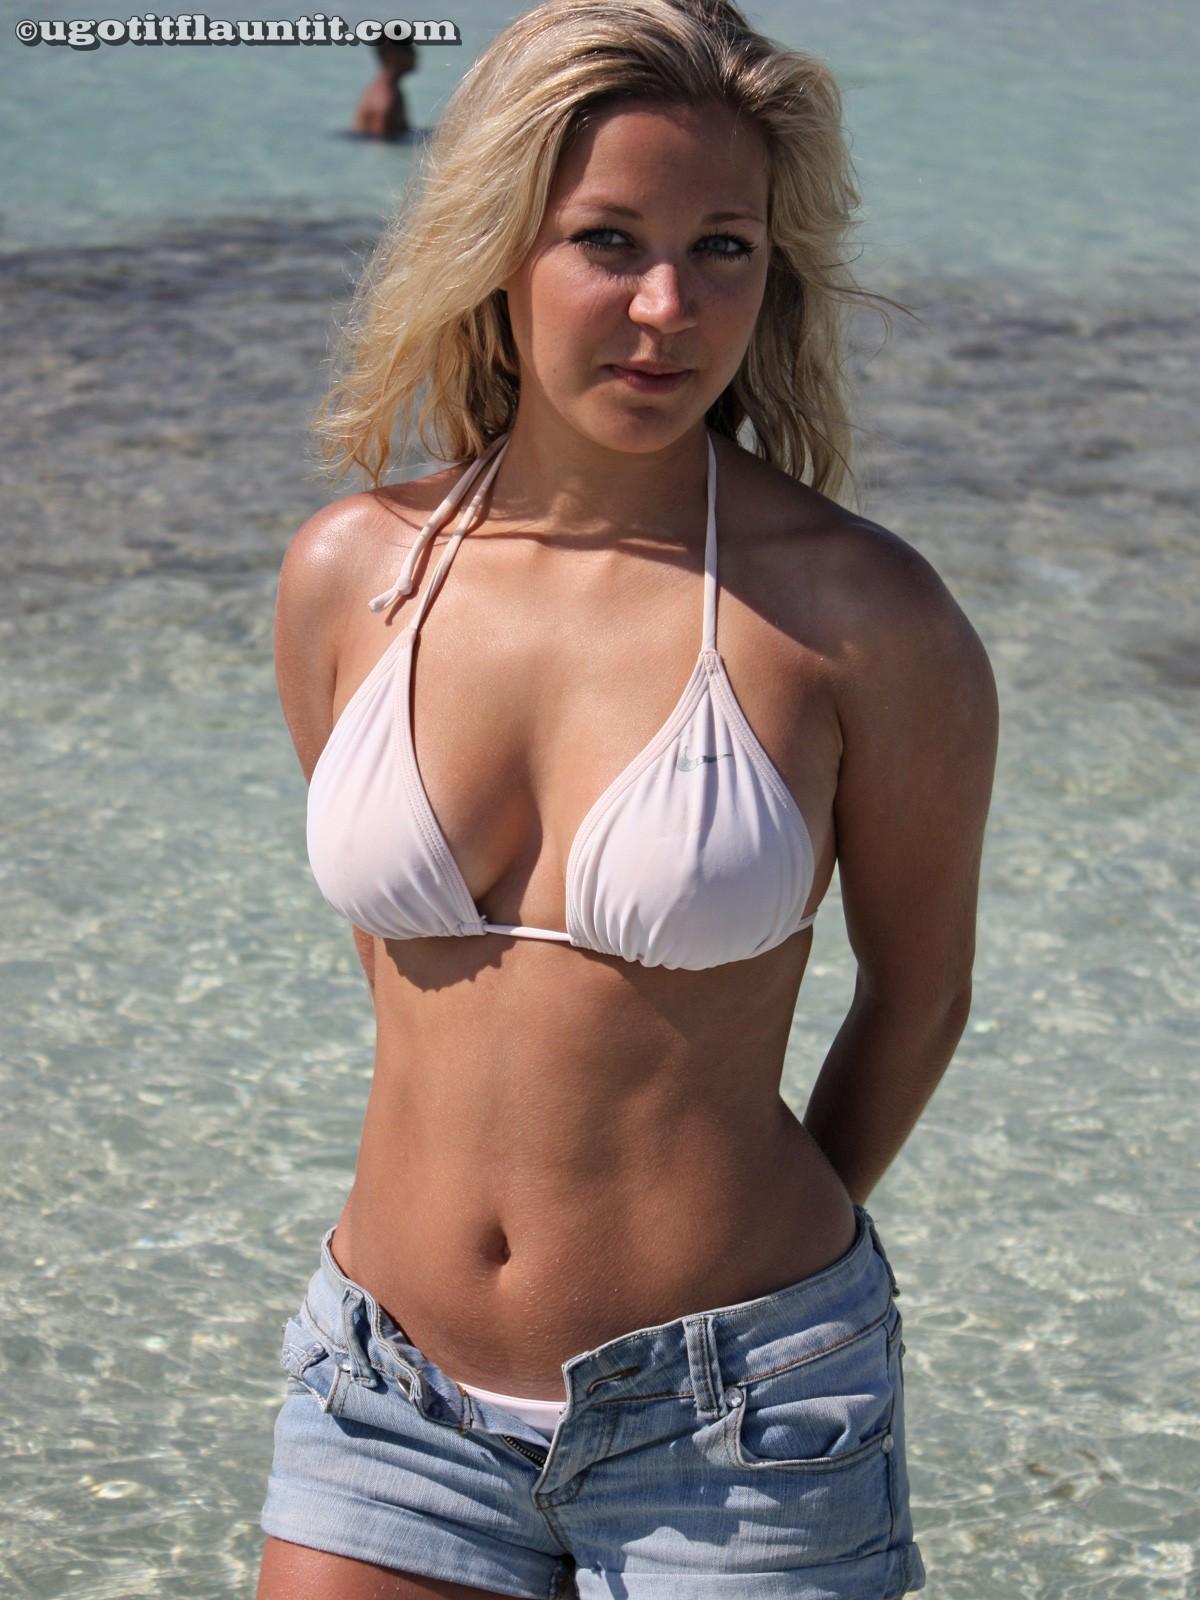 Bikini blonde boobs porn